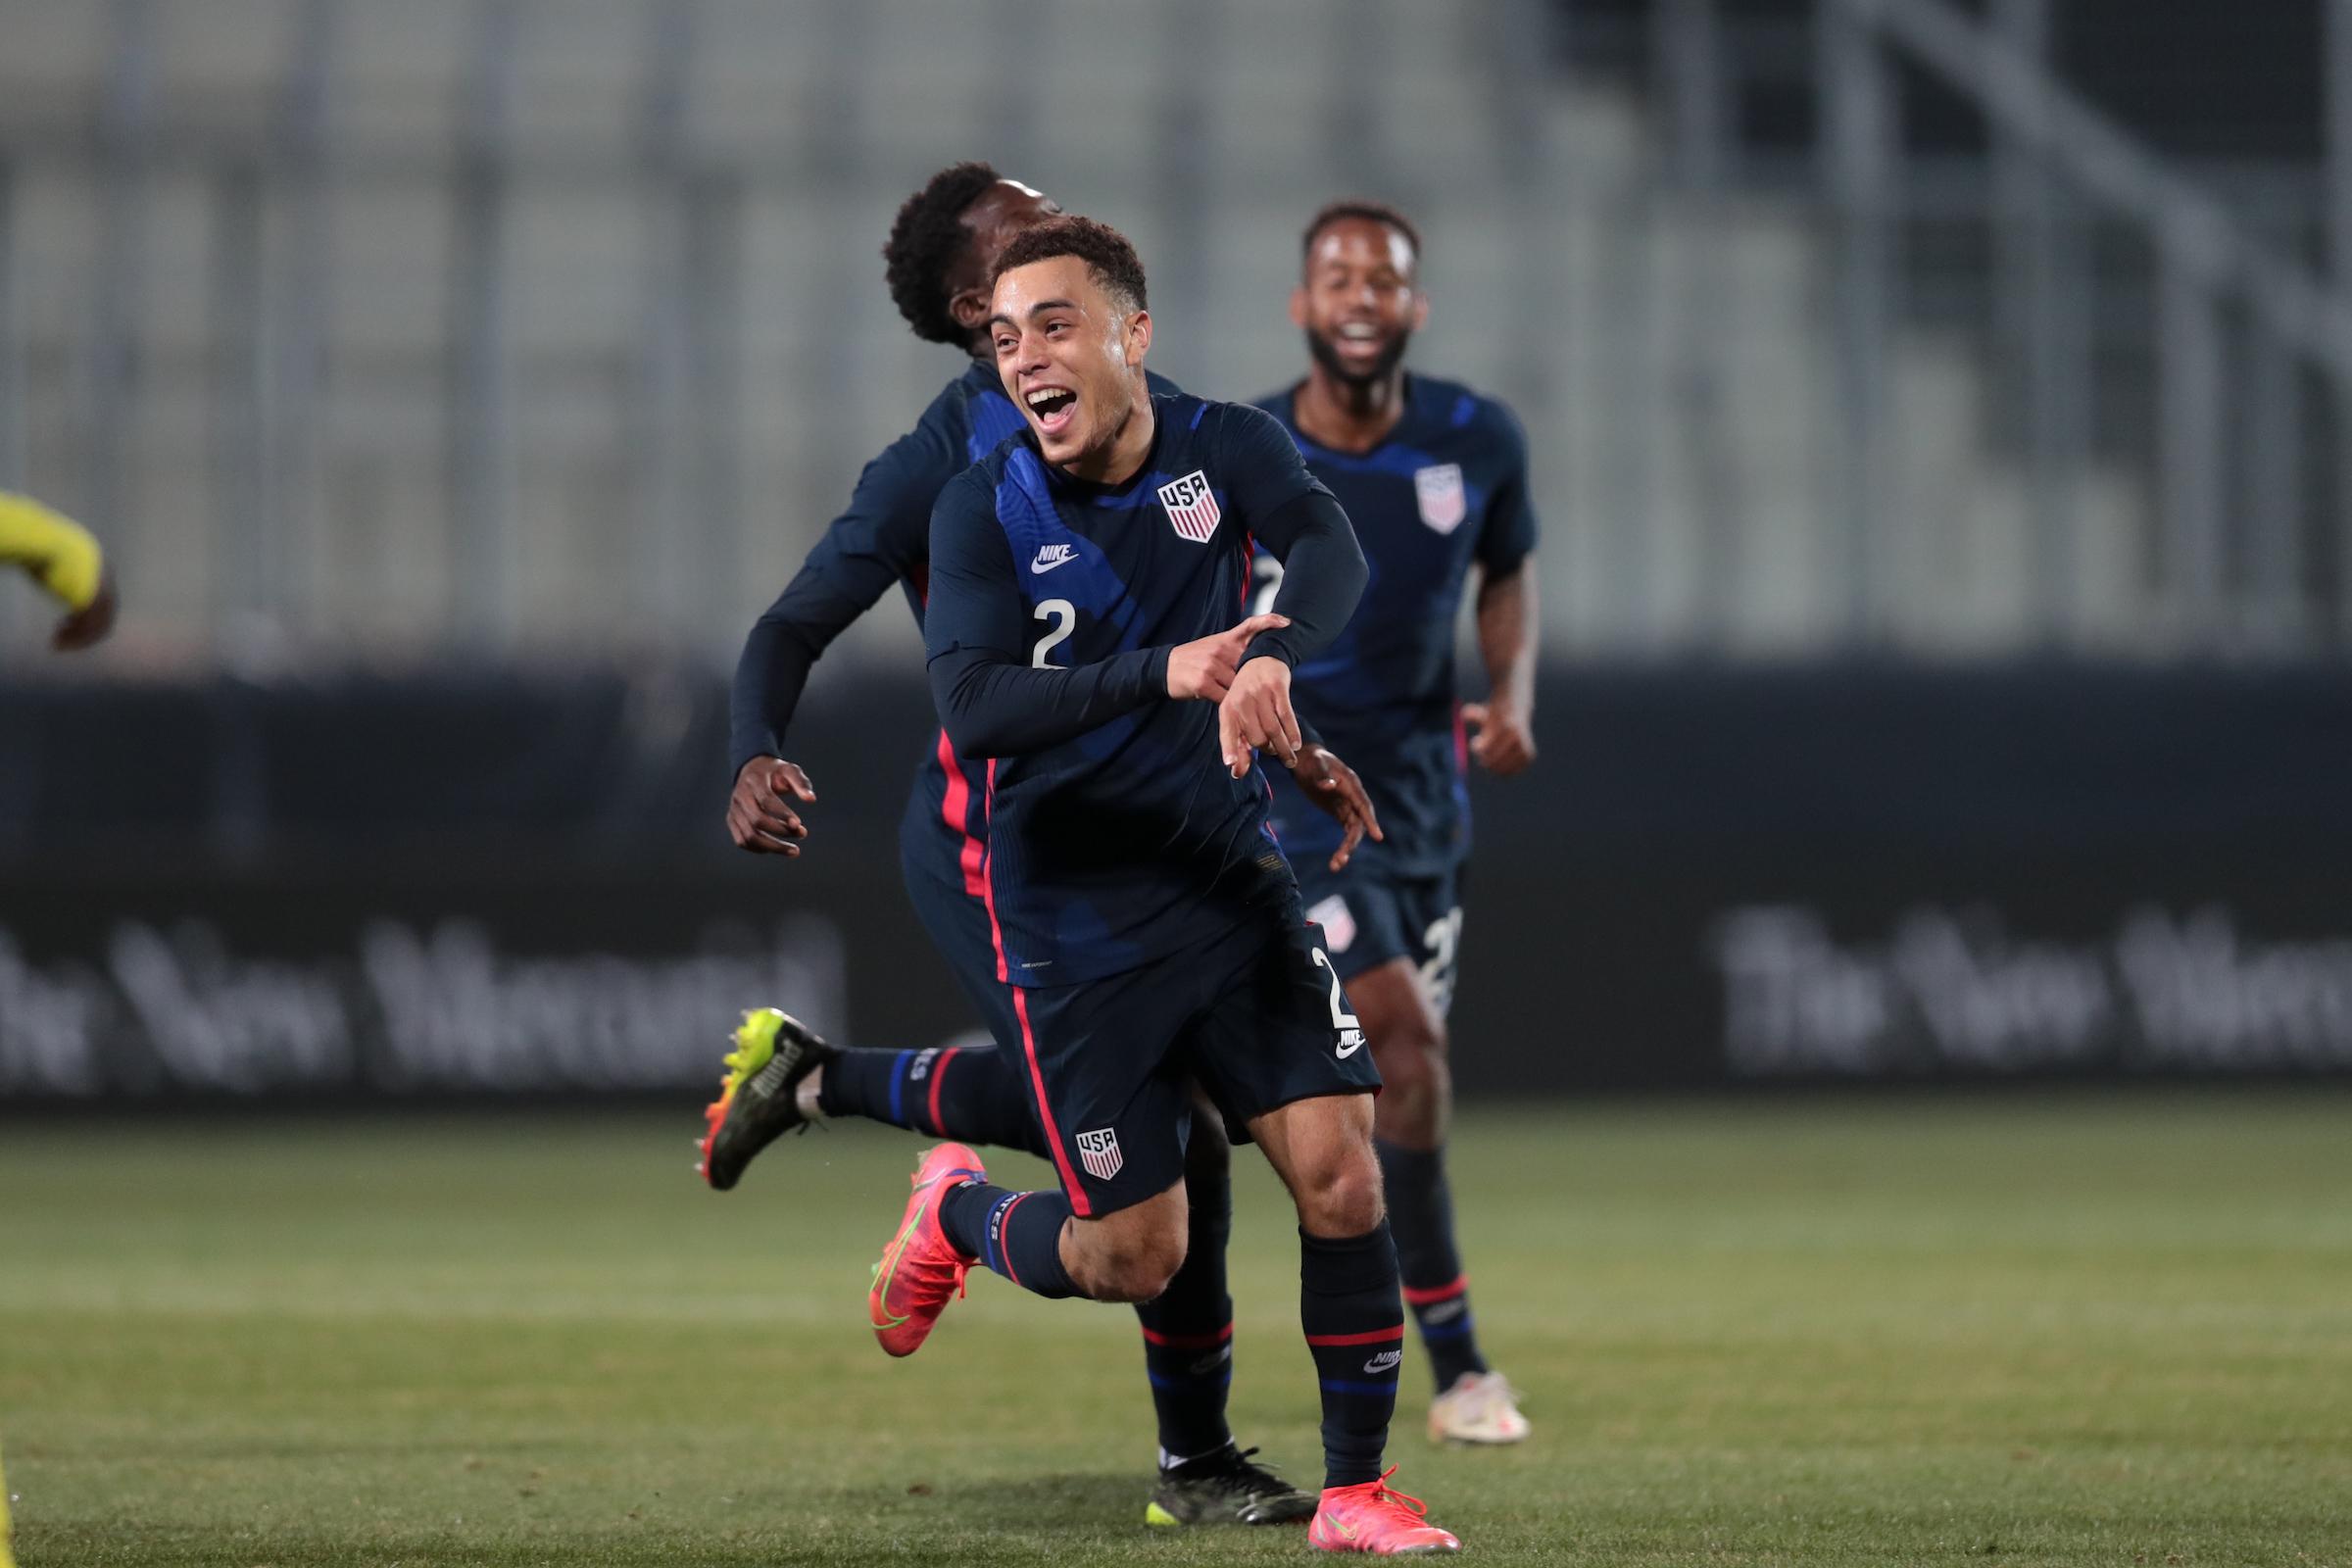 Estados Unidos golea 4-1 a Jamaica en amistoso